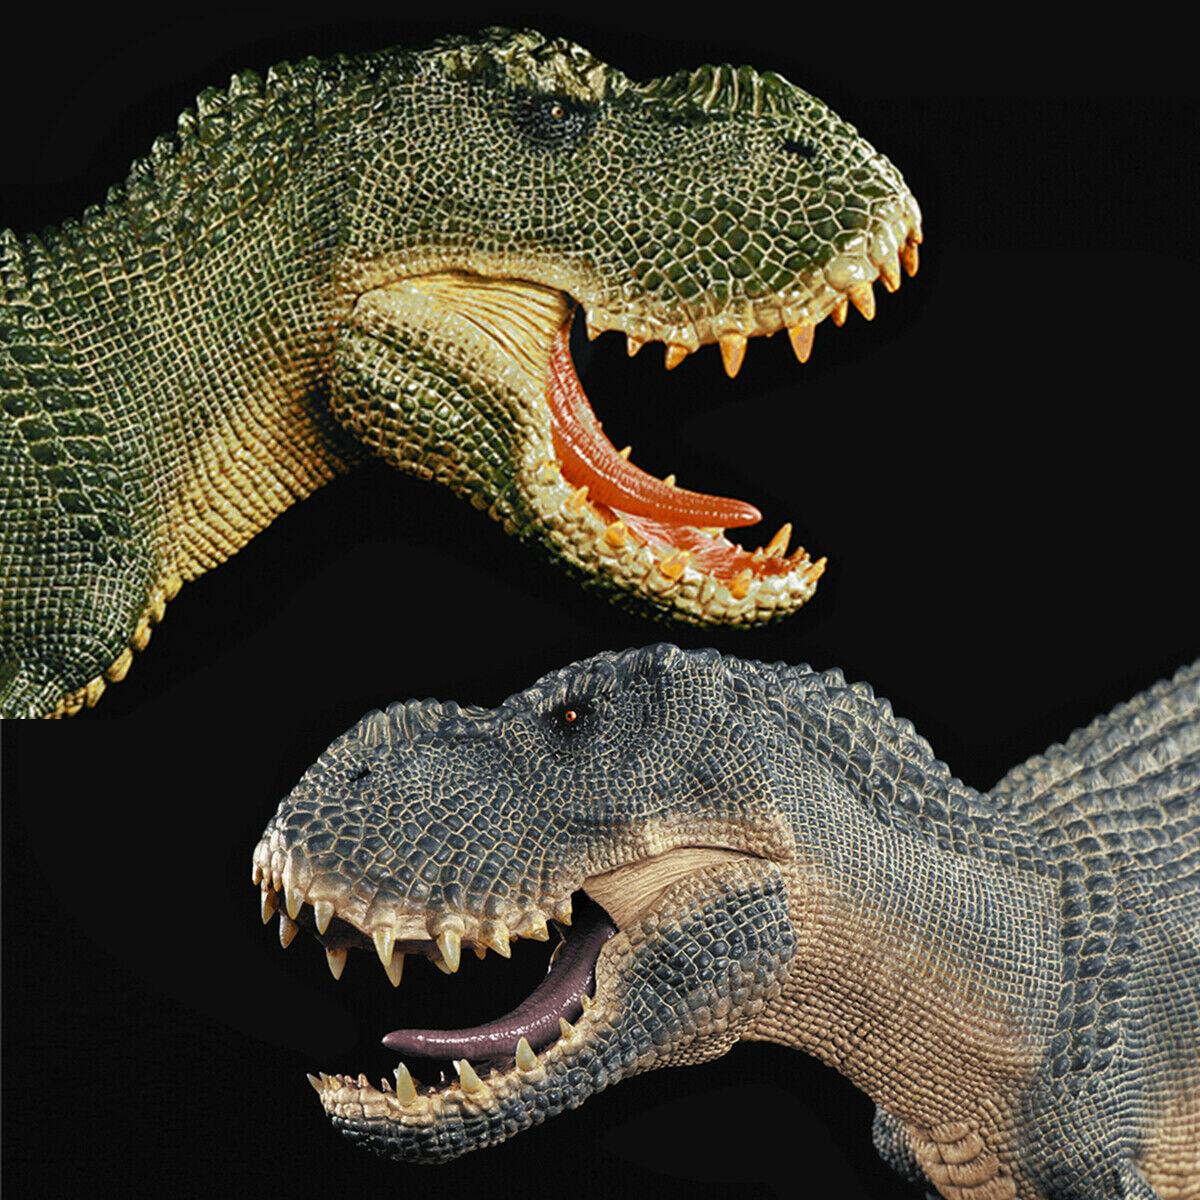 REBOR Cretaceous Period 1/35 Tyrannosaurus Rex T-Rex Collector Dinosaur Model Jungle  Animal Decor Kid Toy